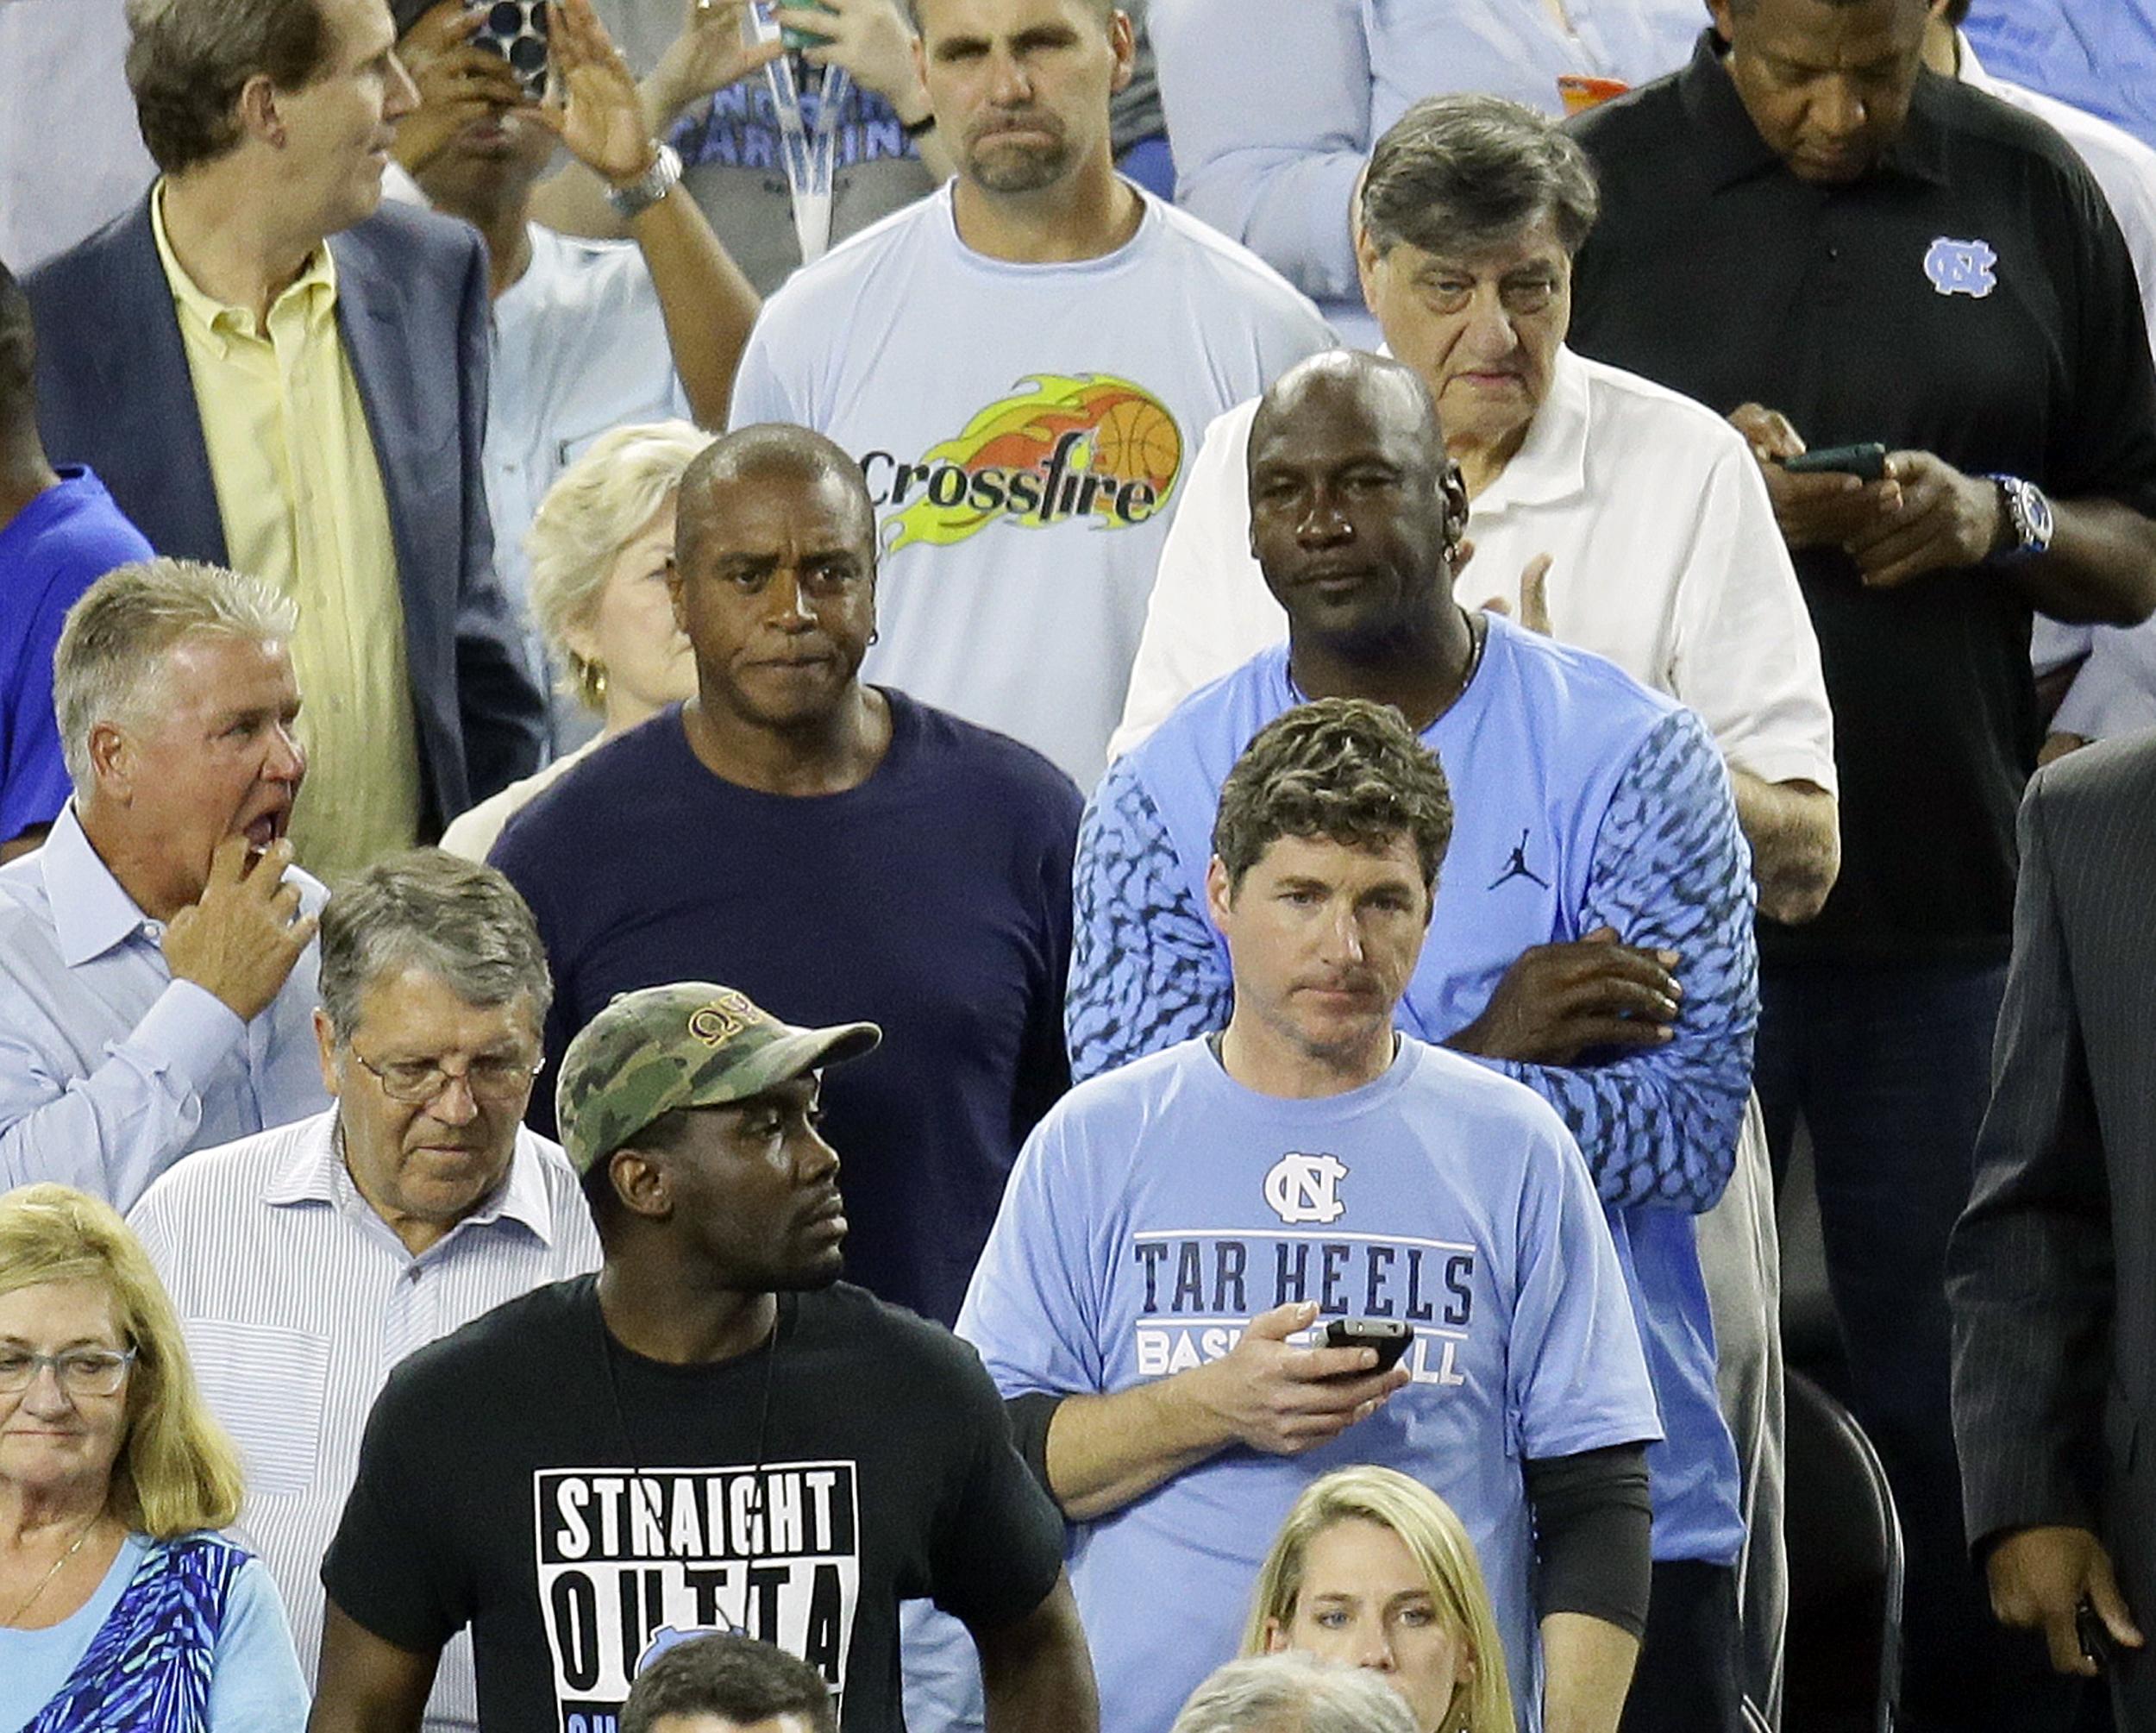 e20ed9aafbe #CryingJordan: Hashtag Surfaces Related to Michael Jordan Meme After North  Carolina's Loss to Villanova